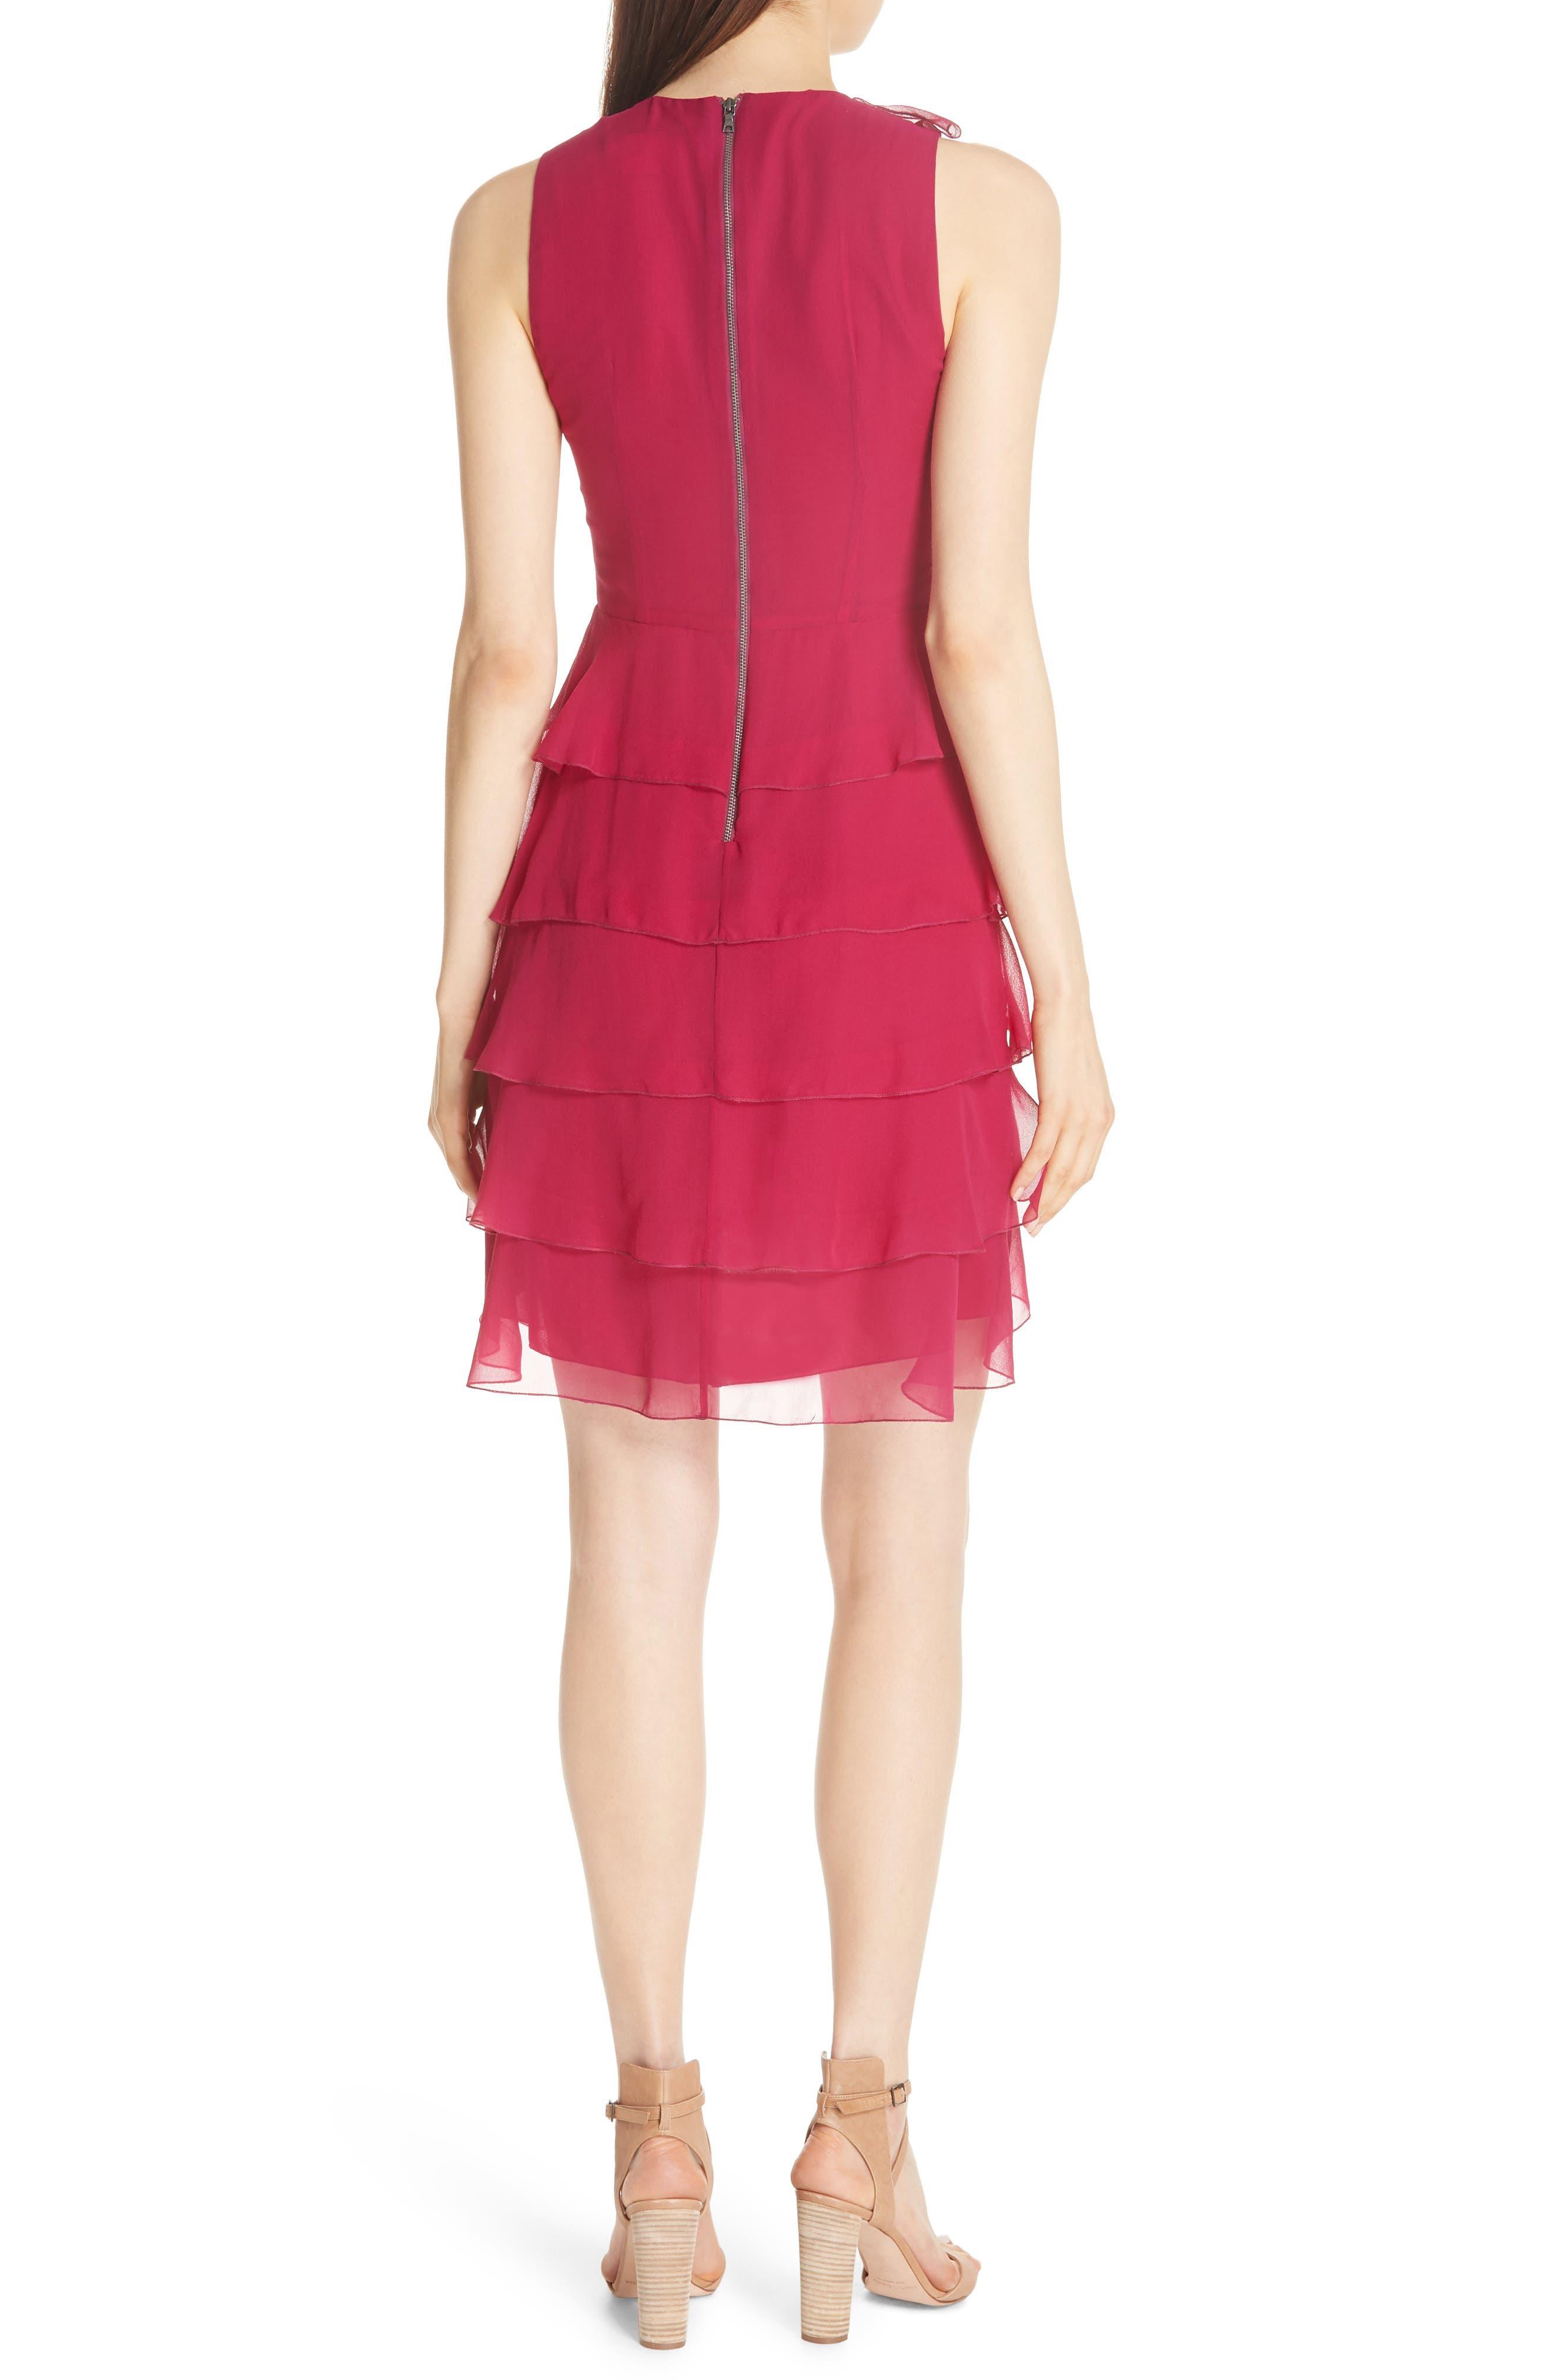 ALICE + OLIVIA,                             Felicita Ruffle Silk Dress,                             Alternate thumbnail 2, color,                             601